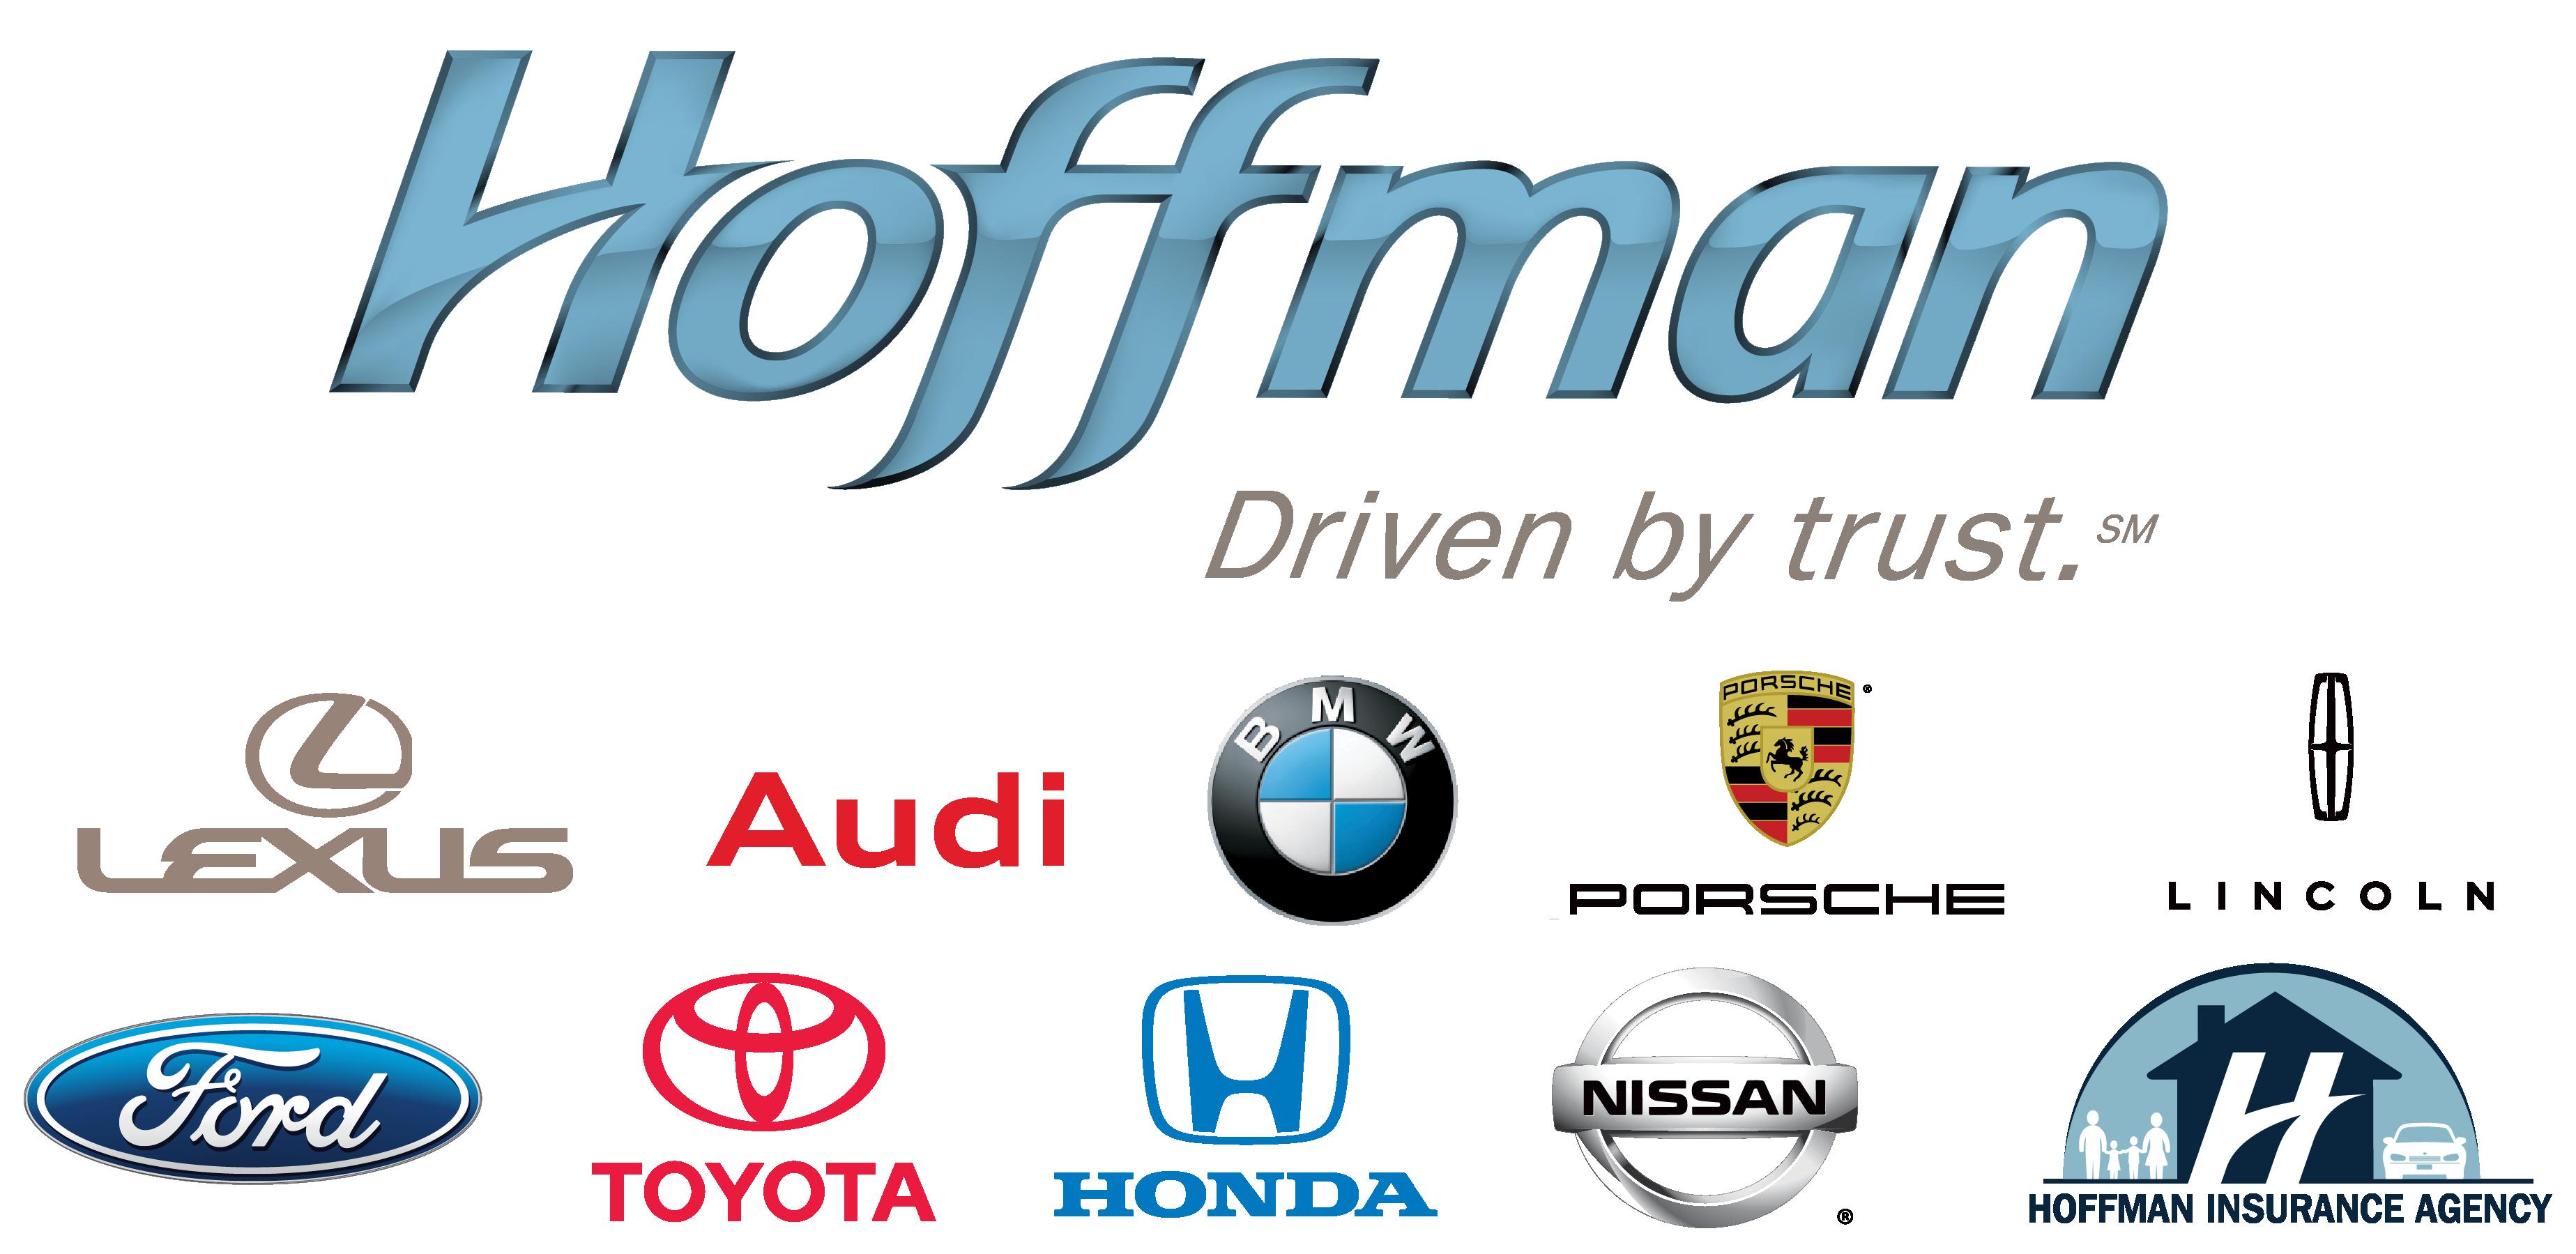 Hoffman auto